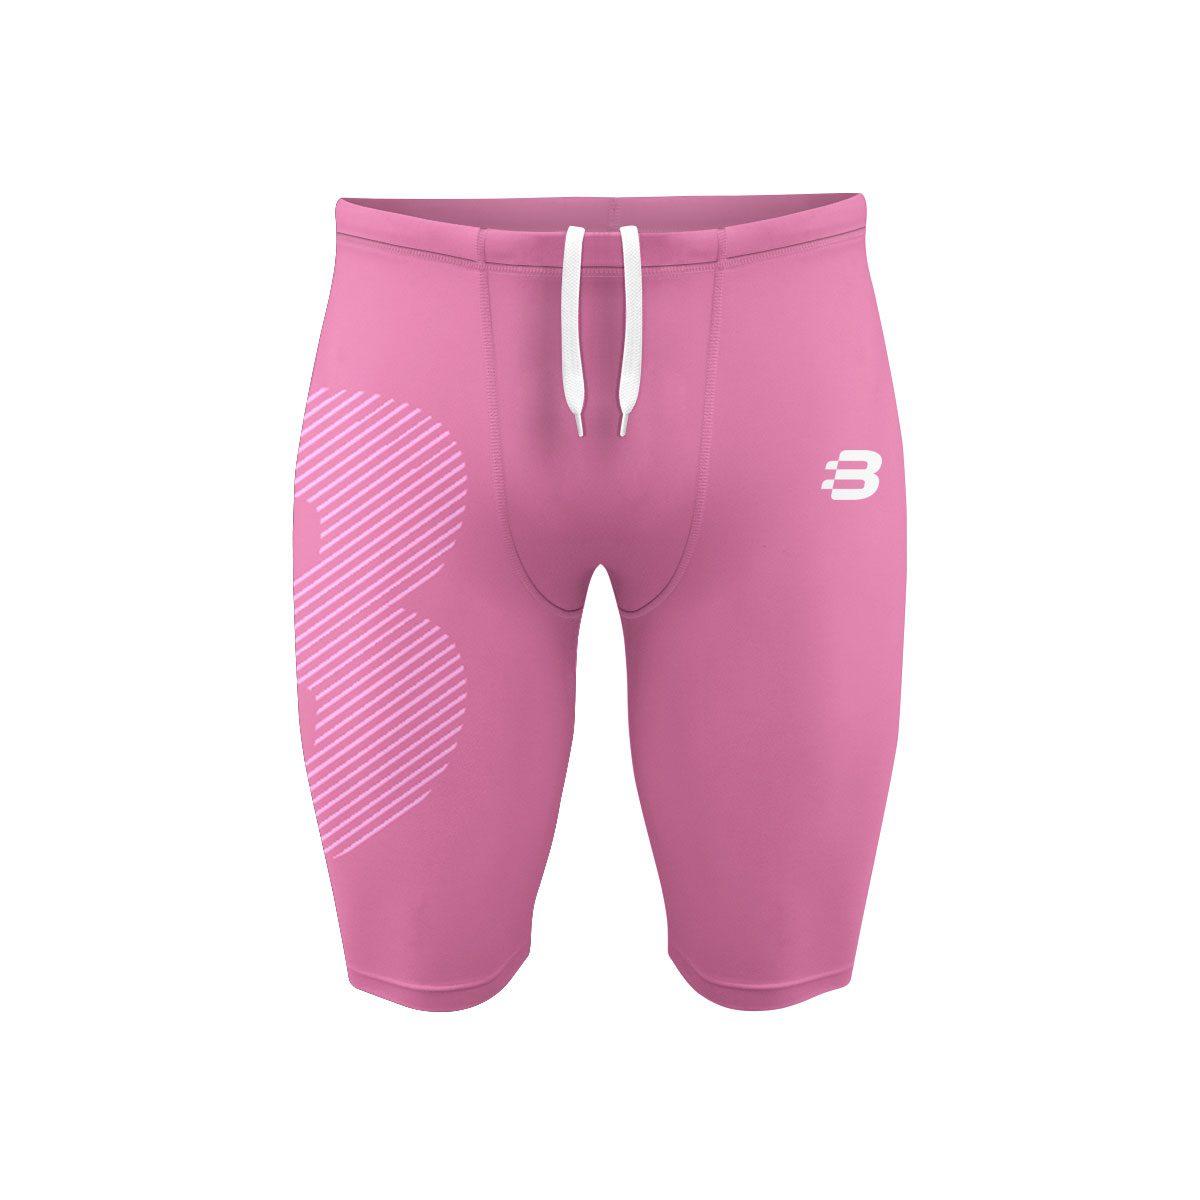 Mens Compression Shorts - Light Pink